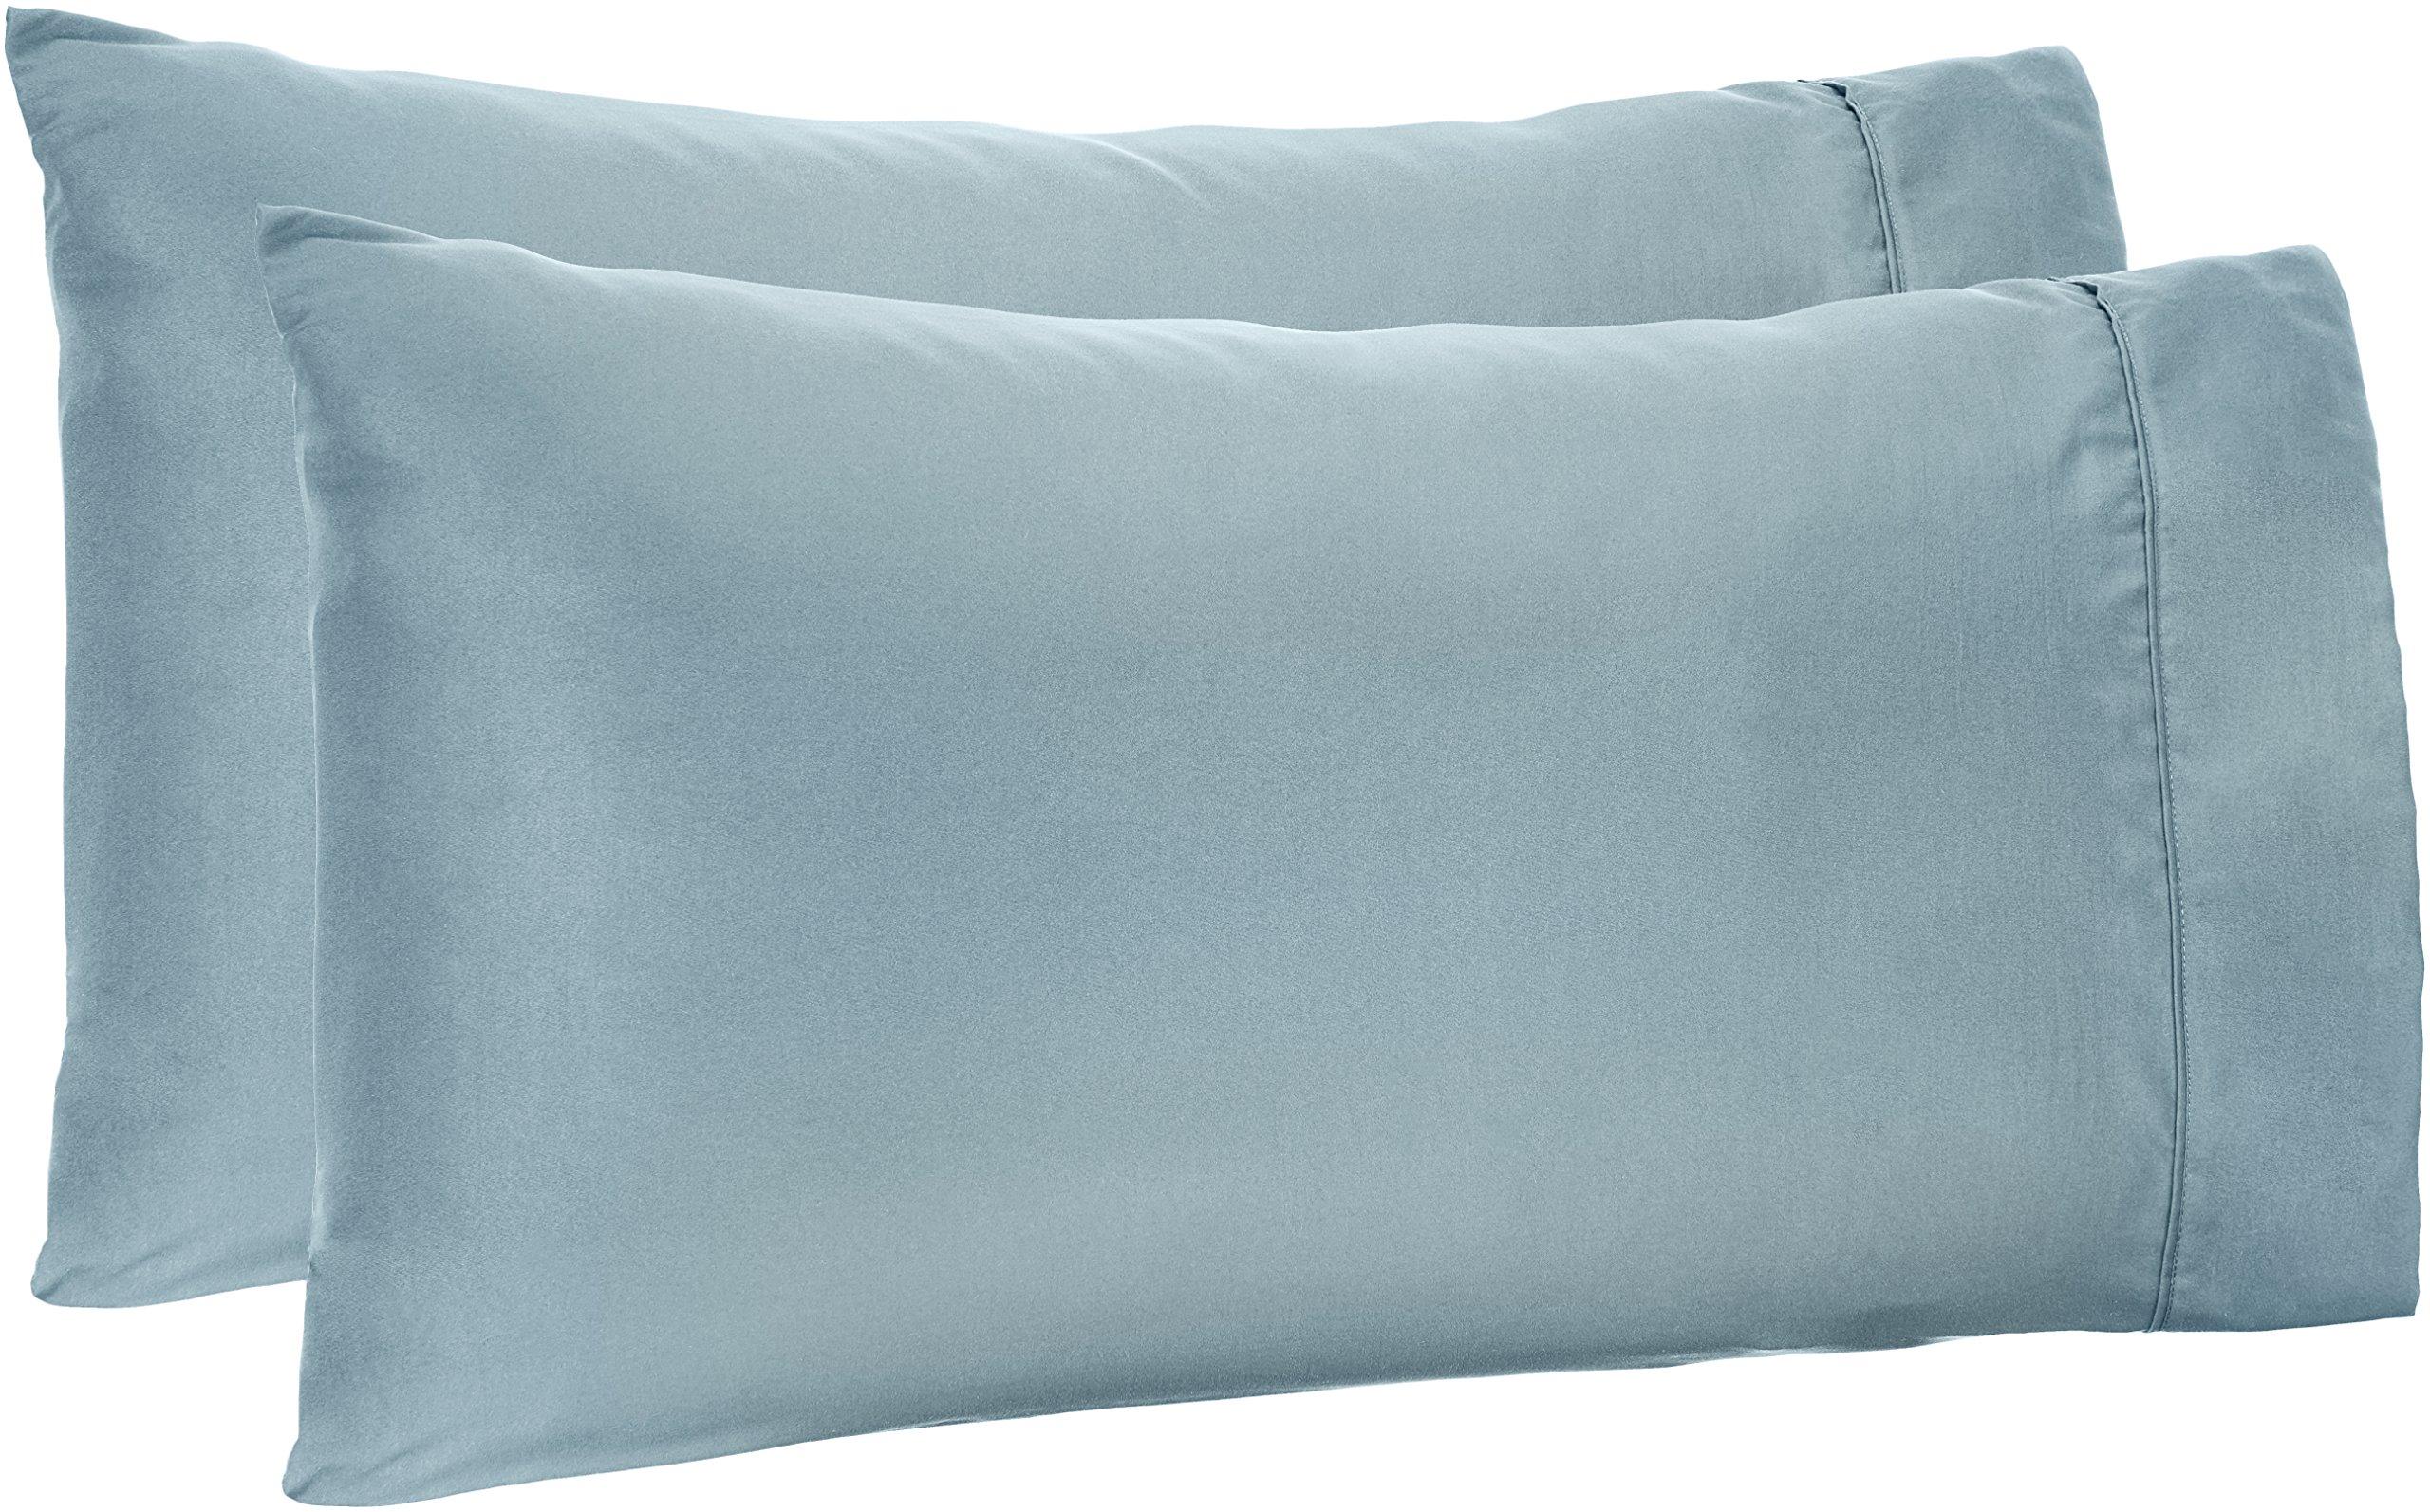 AmazonBasics Microfiber Pillowcases - 2-Pack, King, Spa Blue